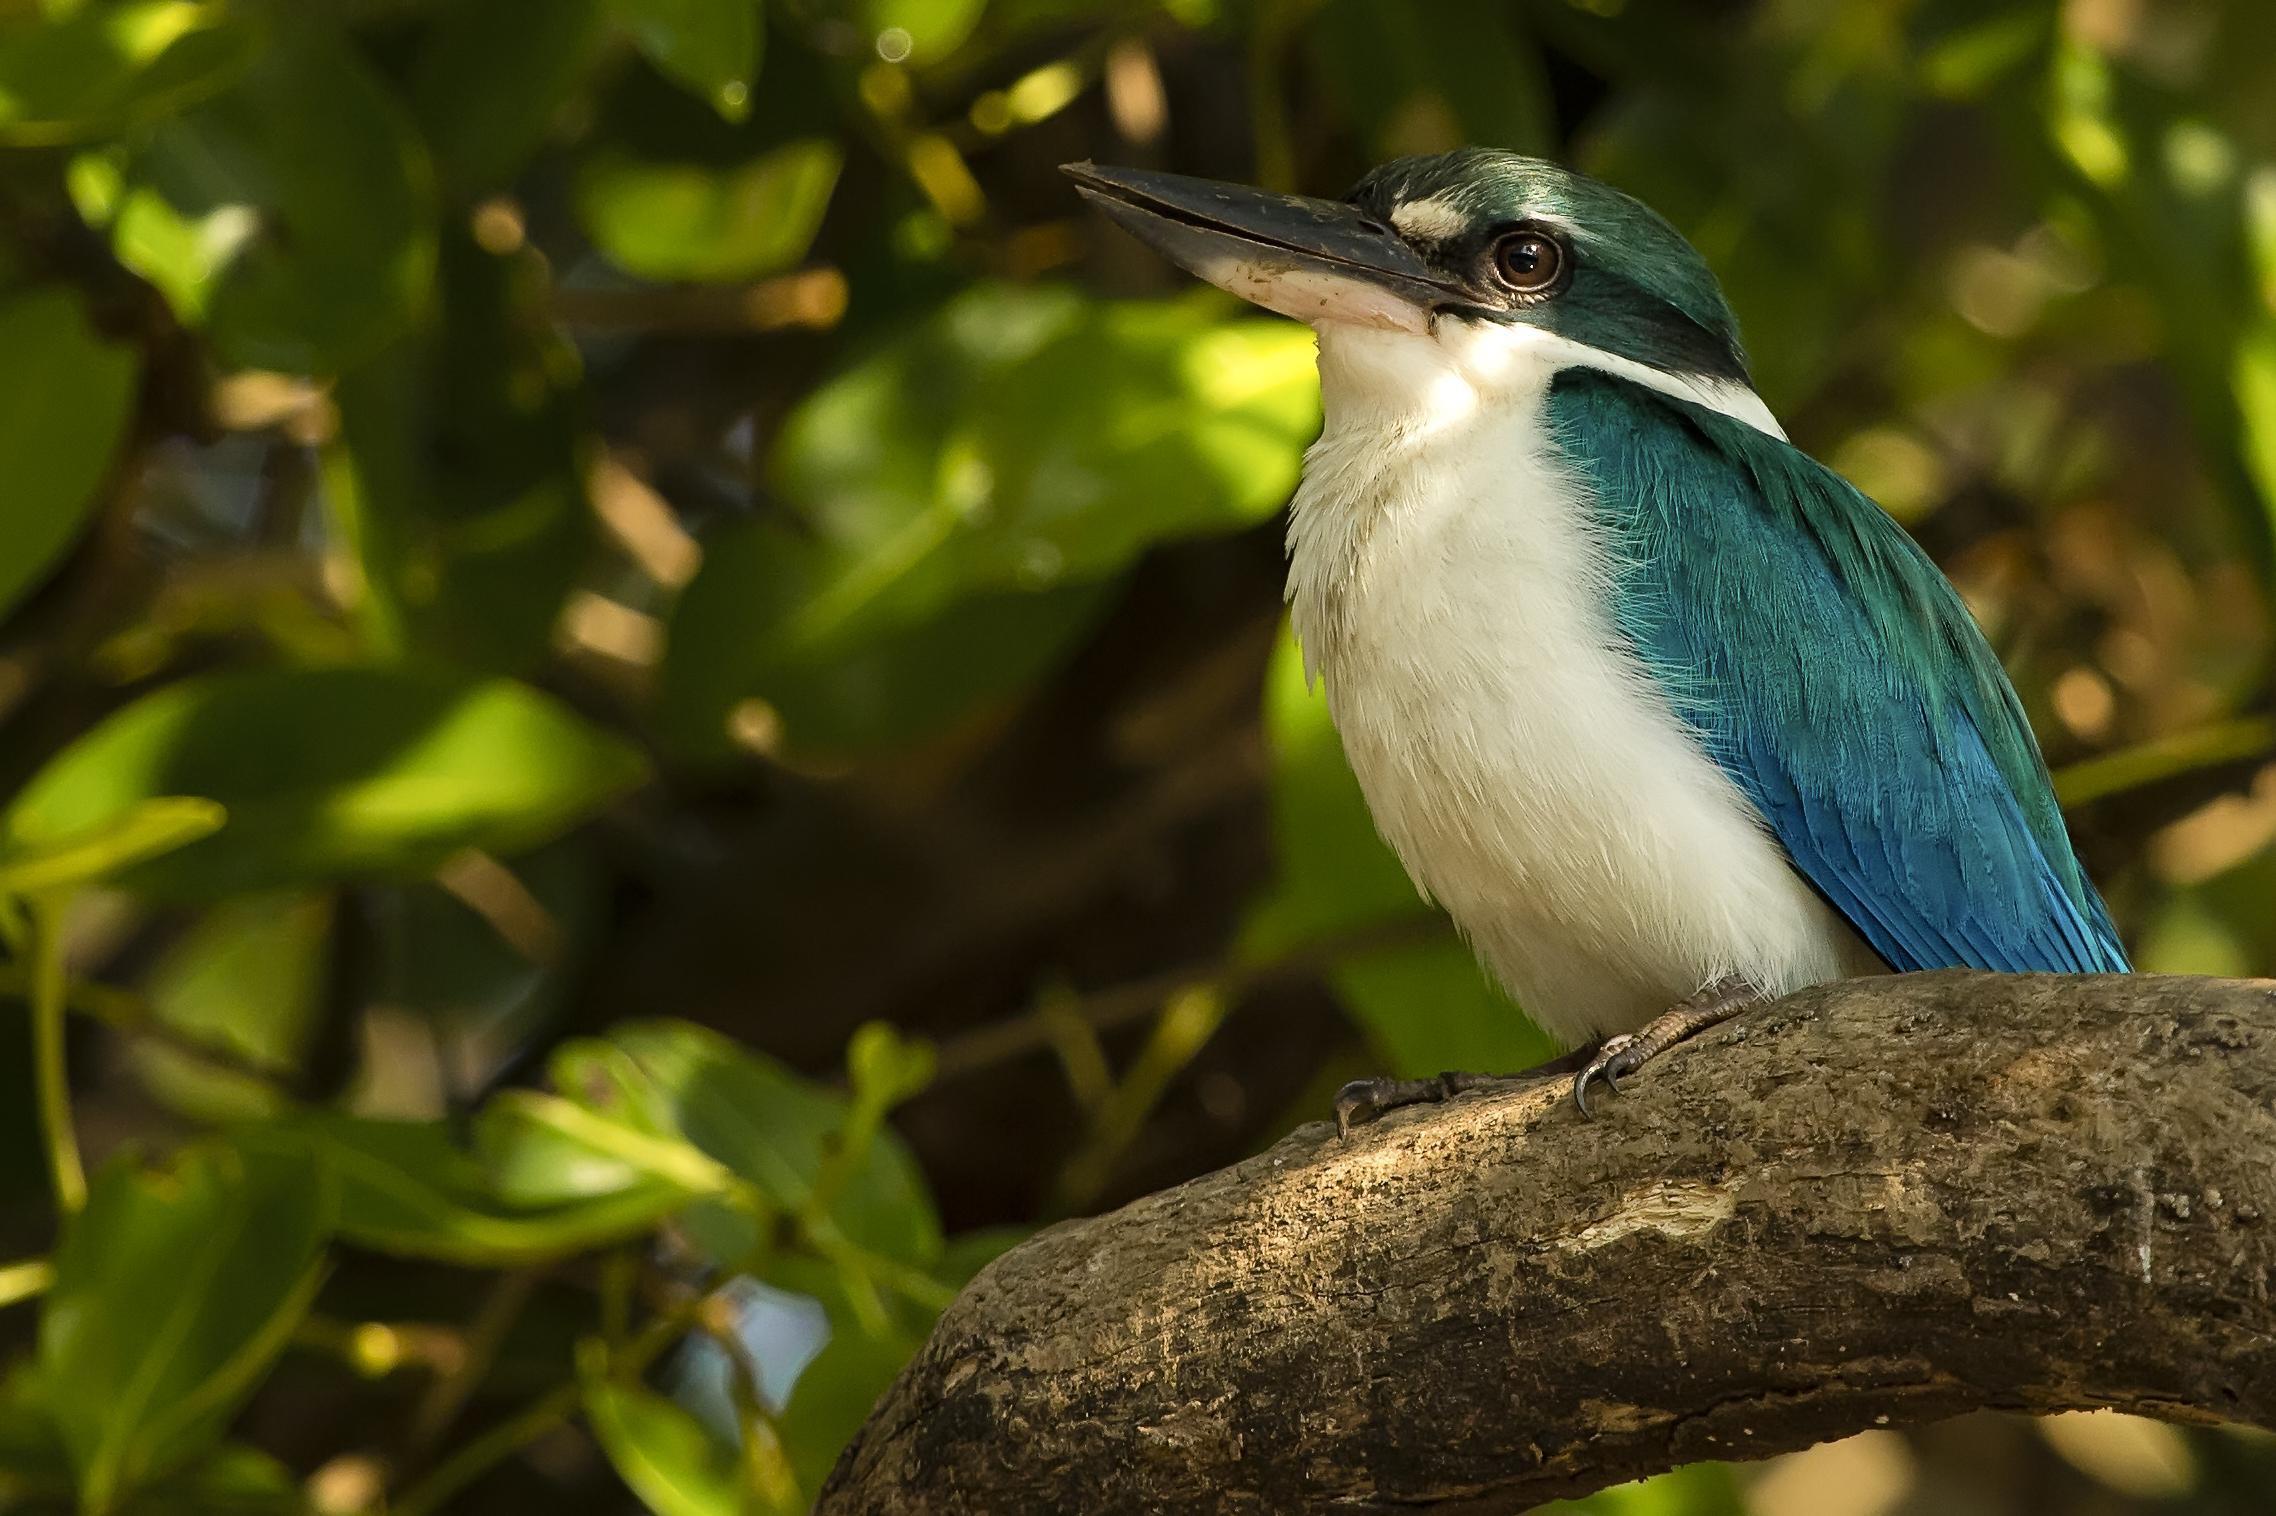 Islet kingfisher